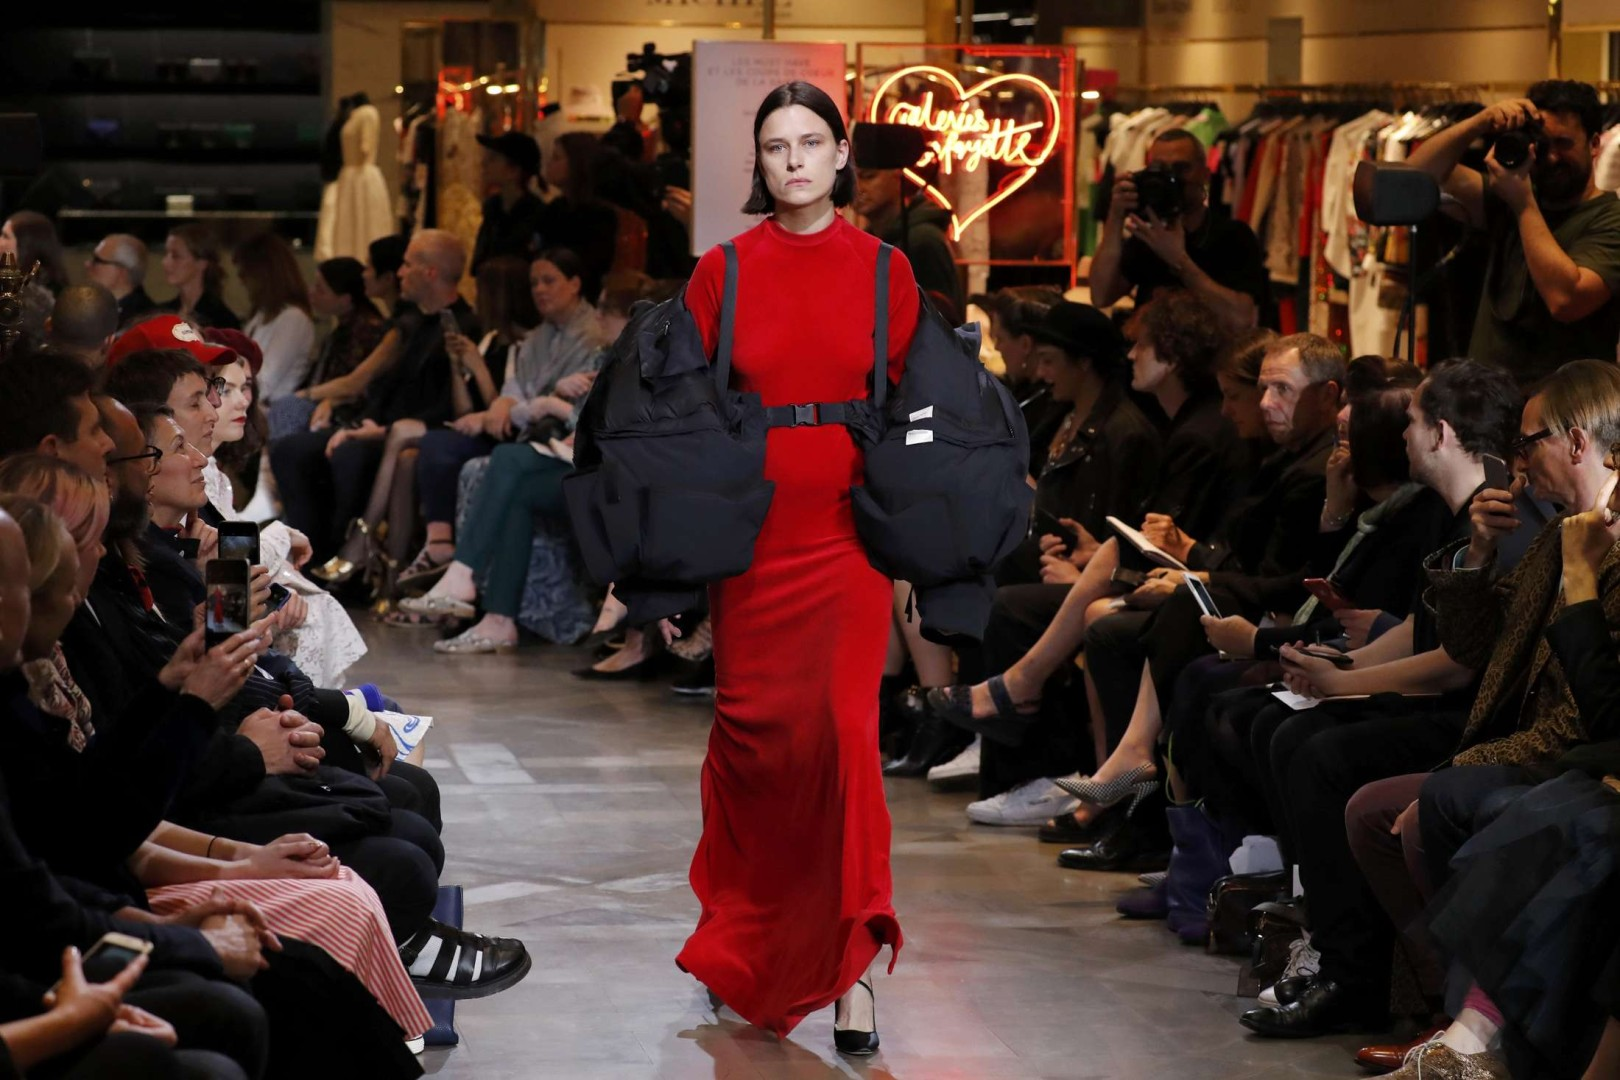 27e4586bf0d9 Juicy Couture meets haute couture as fashion rebel Vetements shakes up  Paris